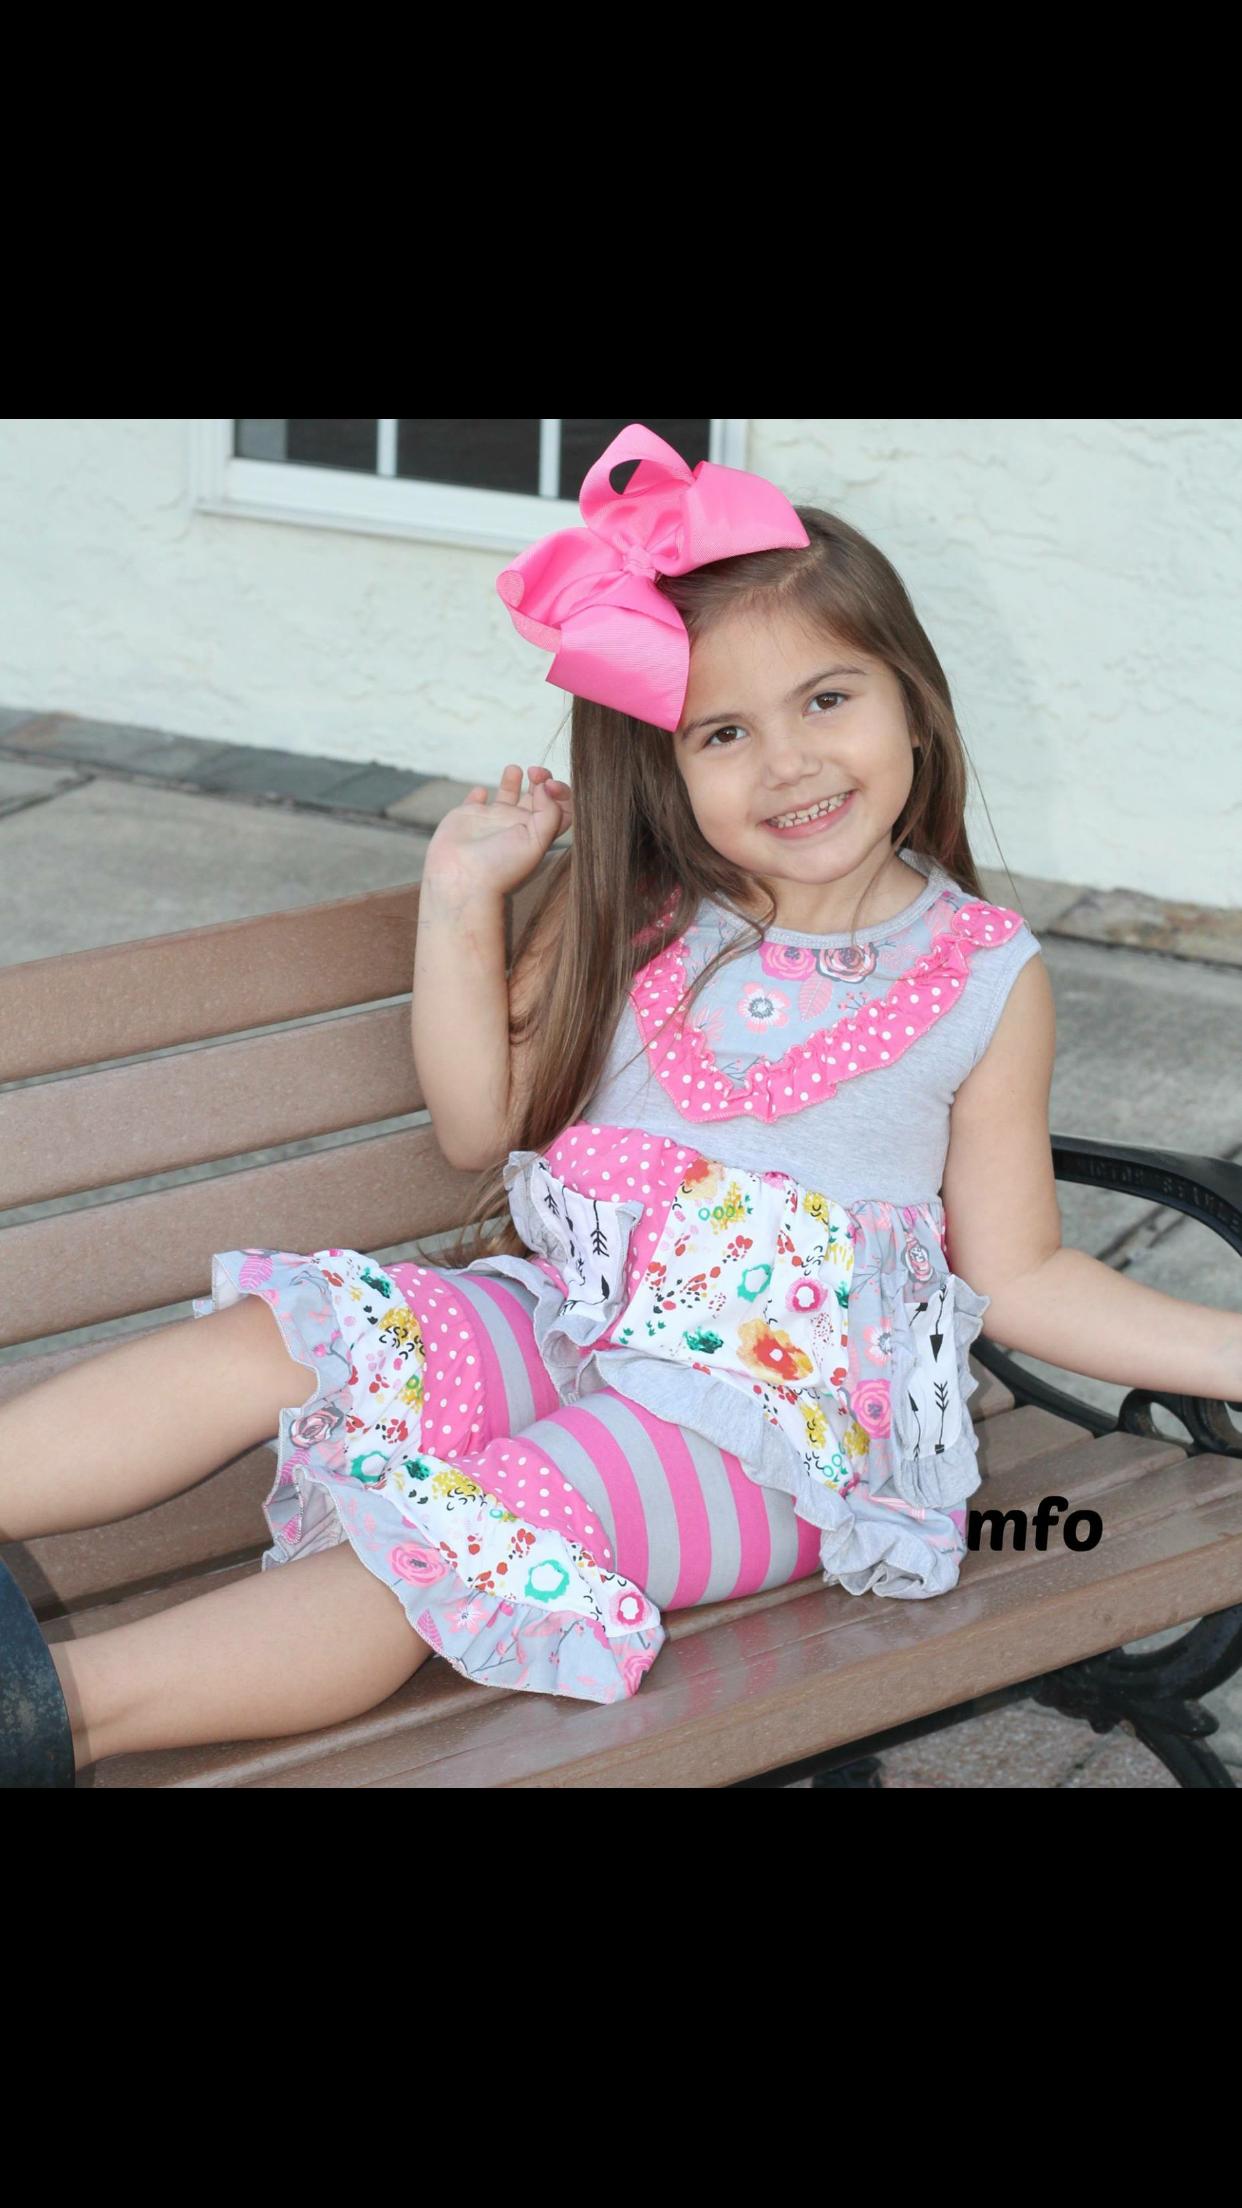 Tutu Pink Boutique 452 Harrison Ave, Panama City, FL 32401 - YP.com